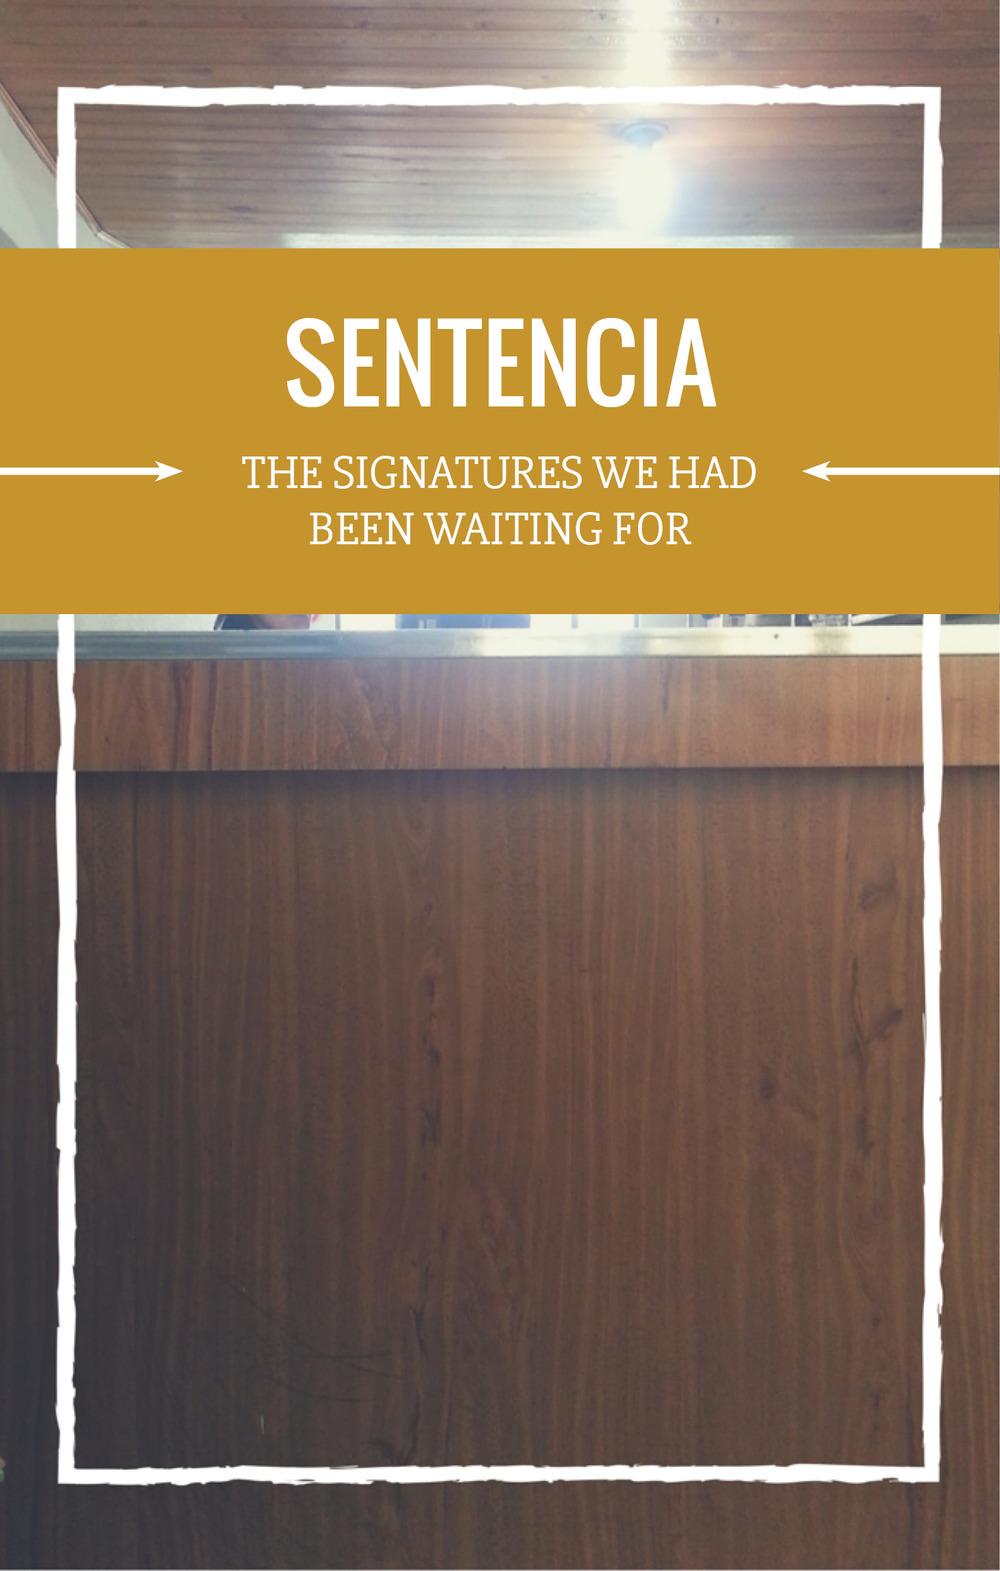 Sentencia the judge signed - NJS Design Company